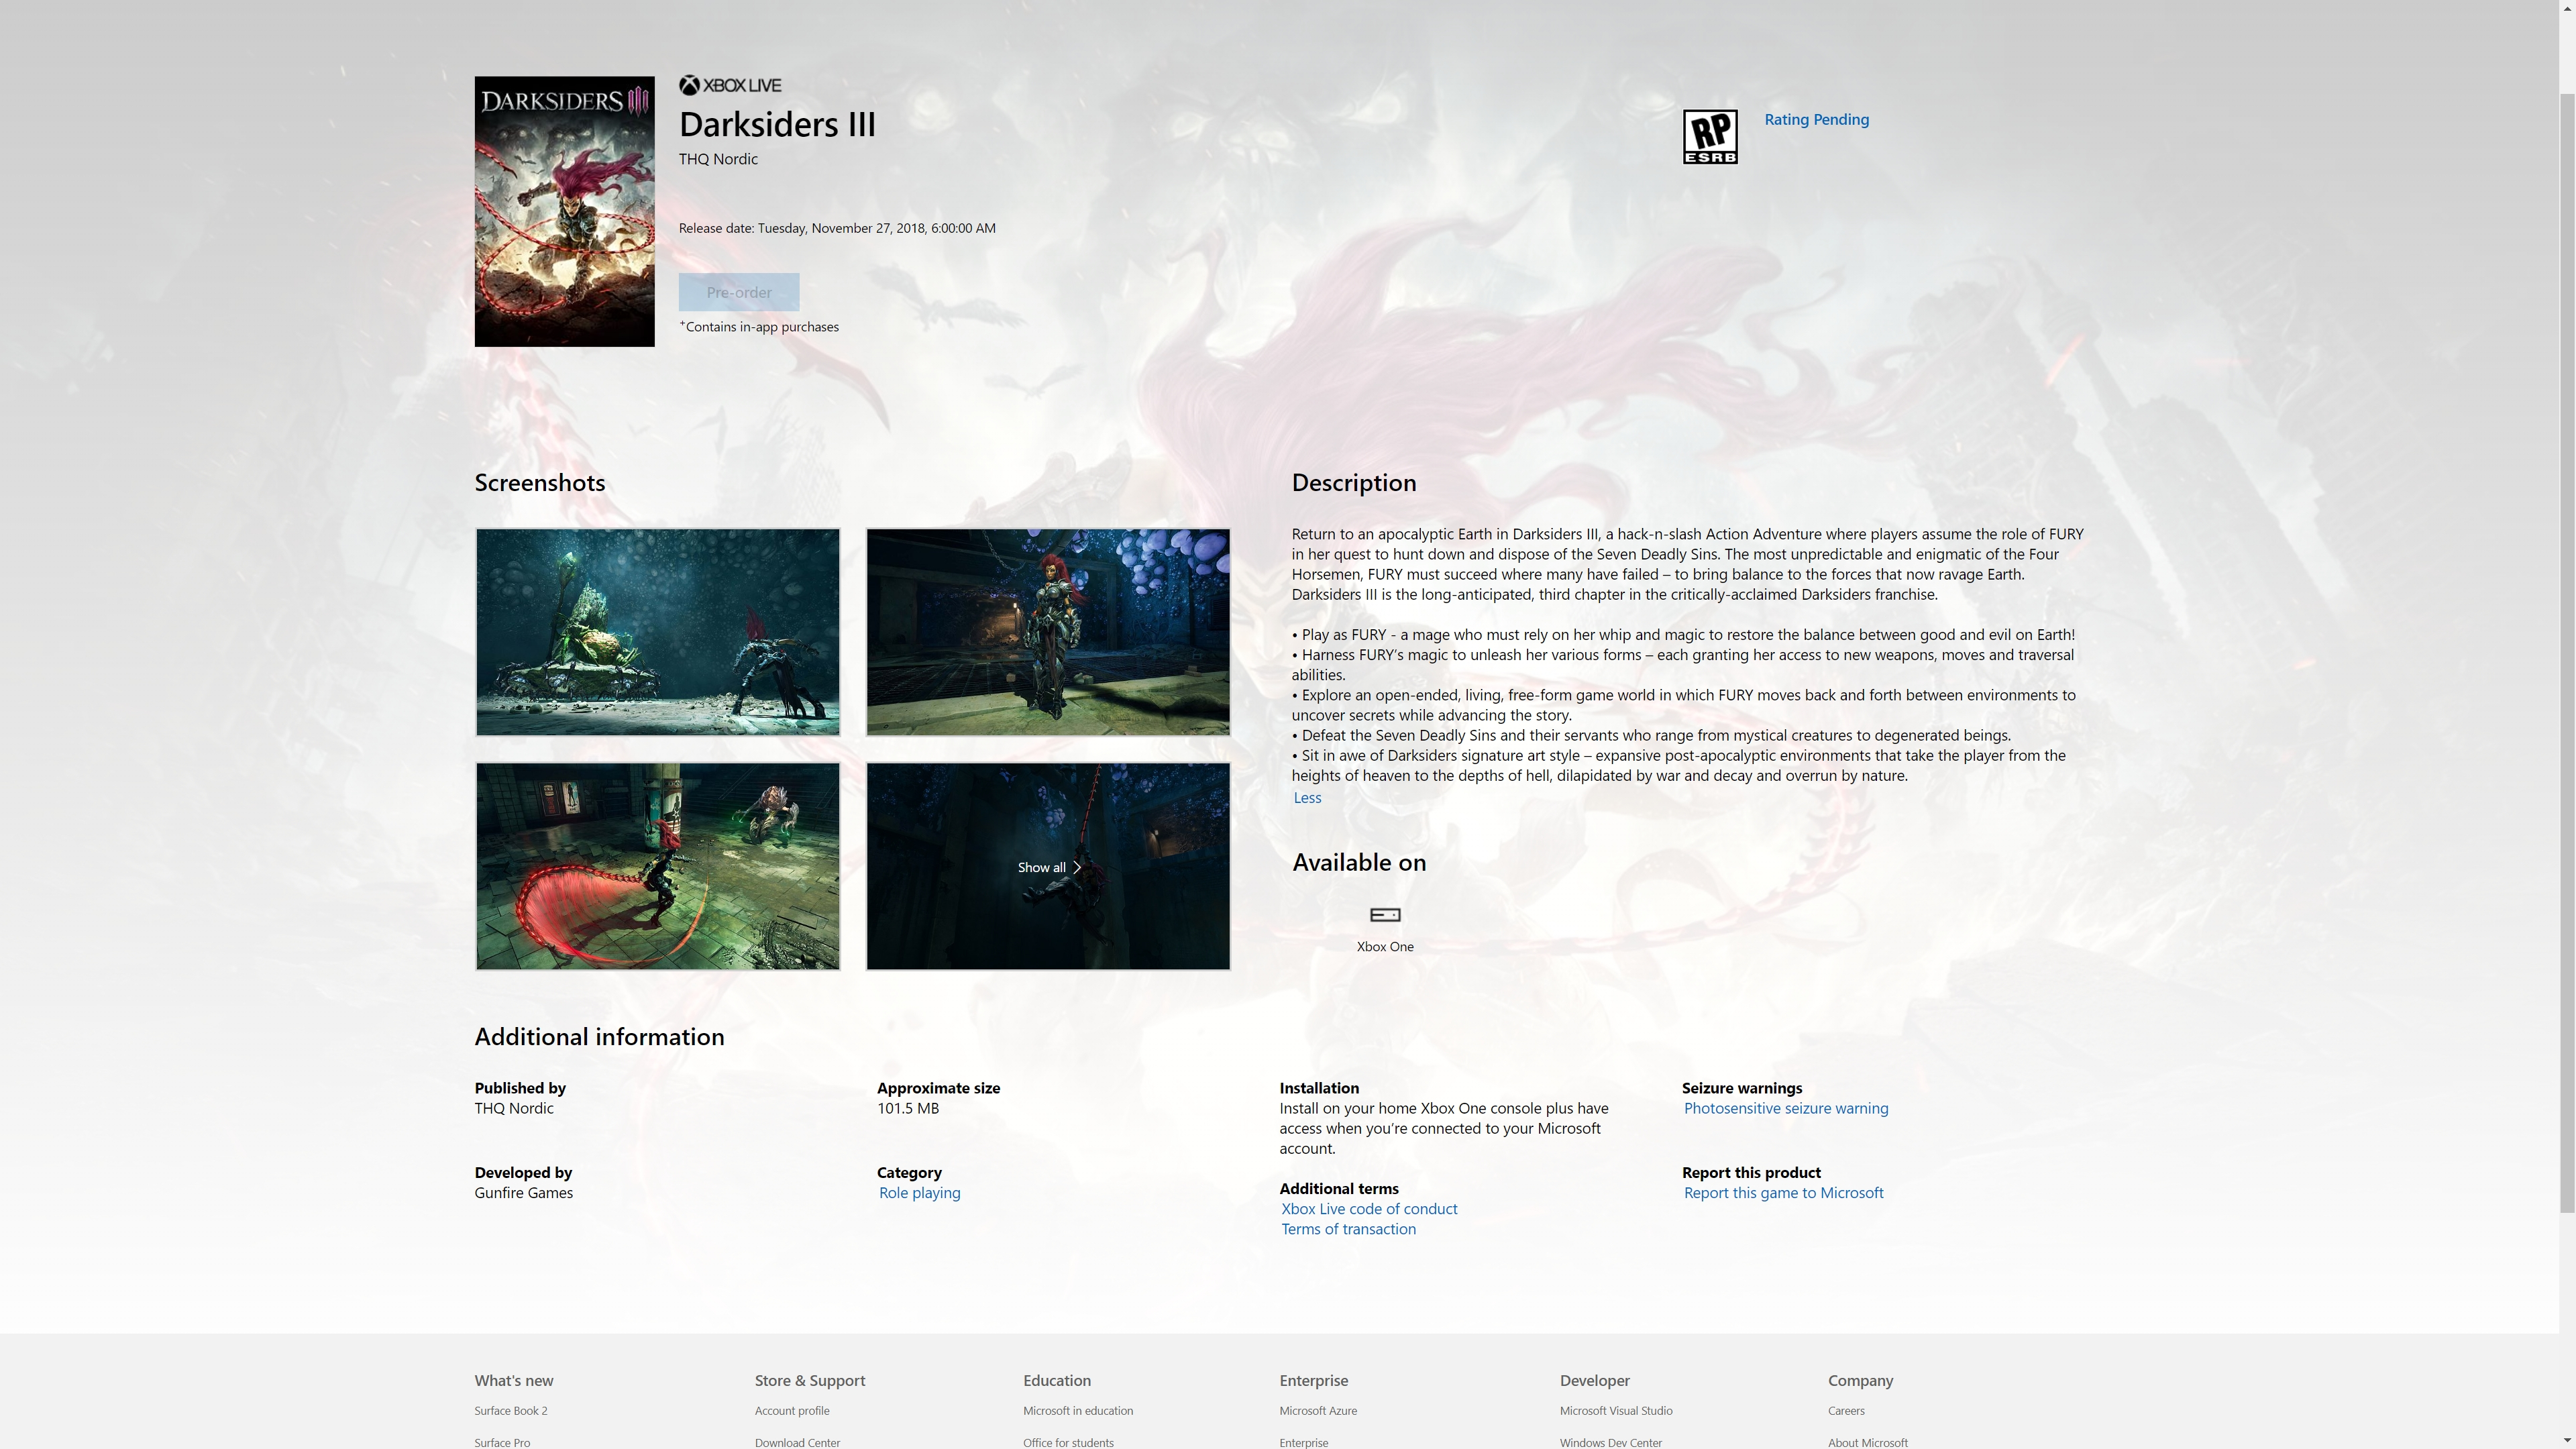 Darksiders III November Release Date Made Official